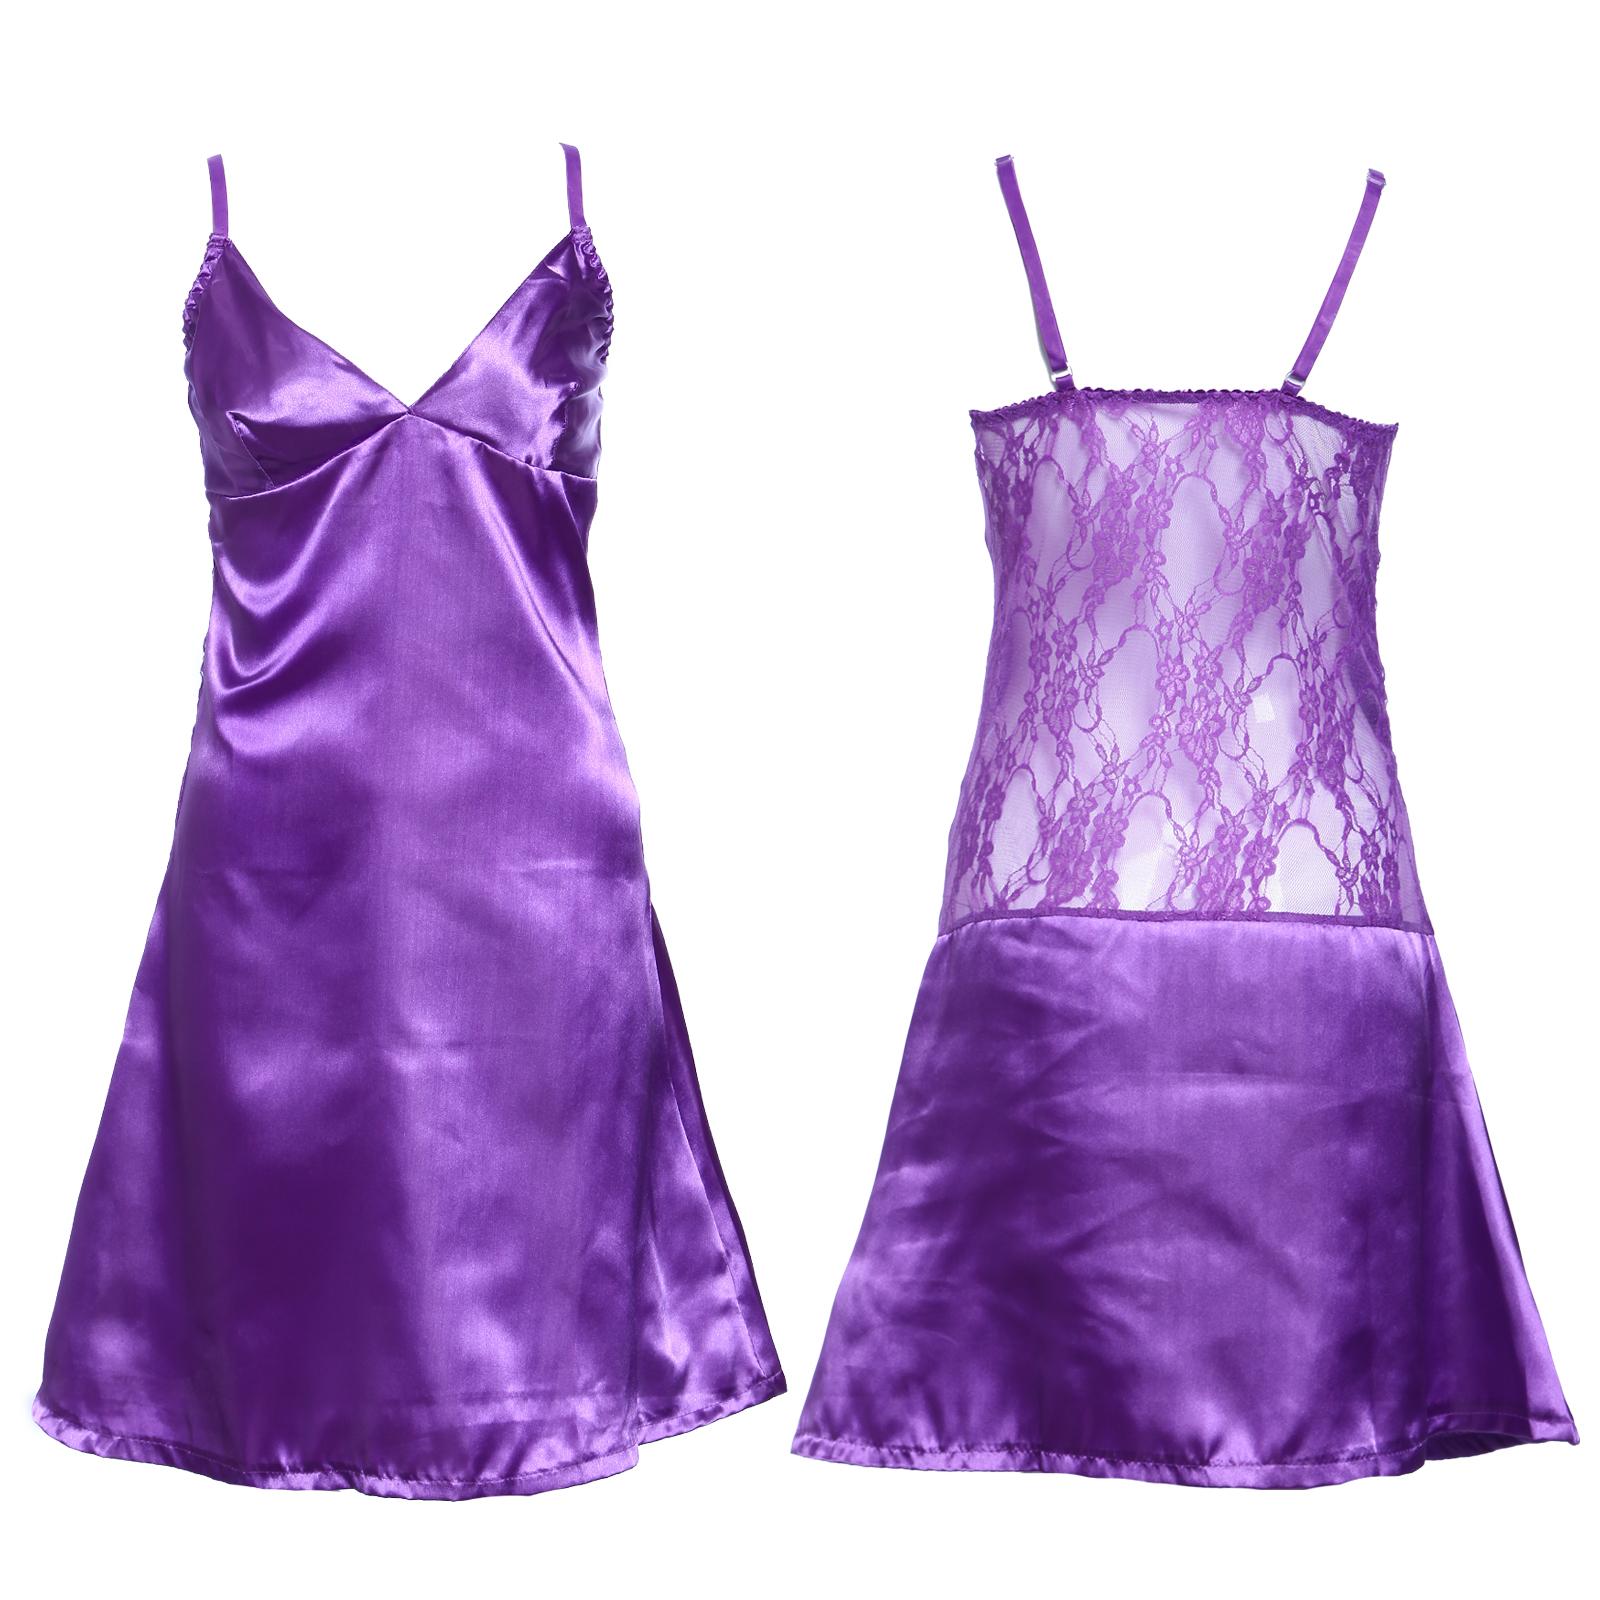 sexy 3tlg satin spitze nachthemd nachtmantel nachtkleid dessous negligee set ebay. Black Bedroom Furniture Sets. Home Design Ideas